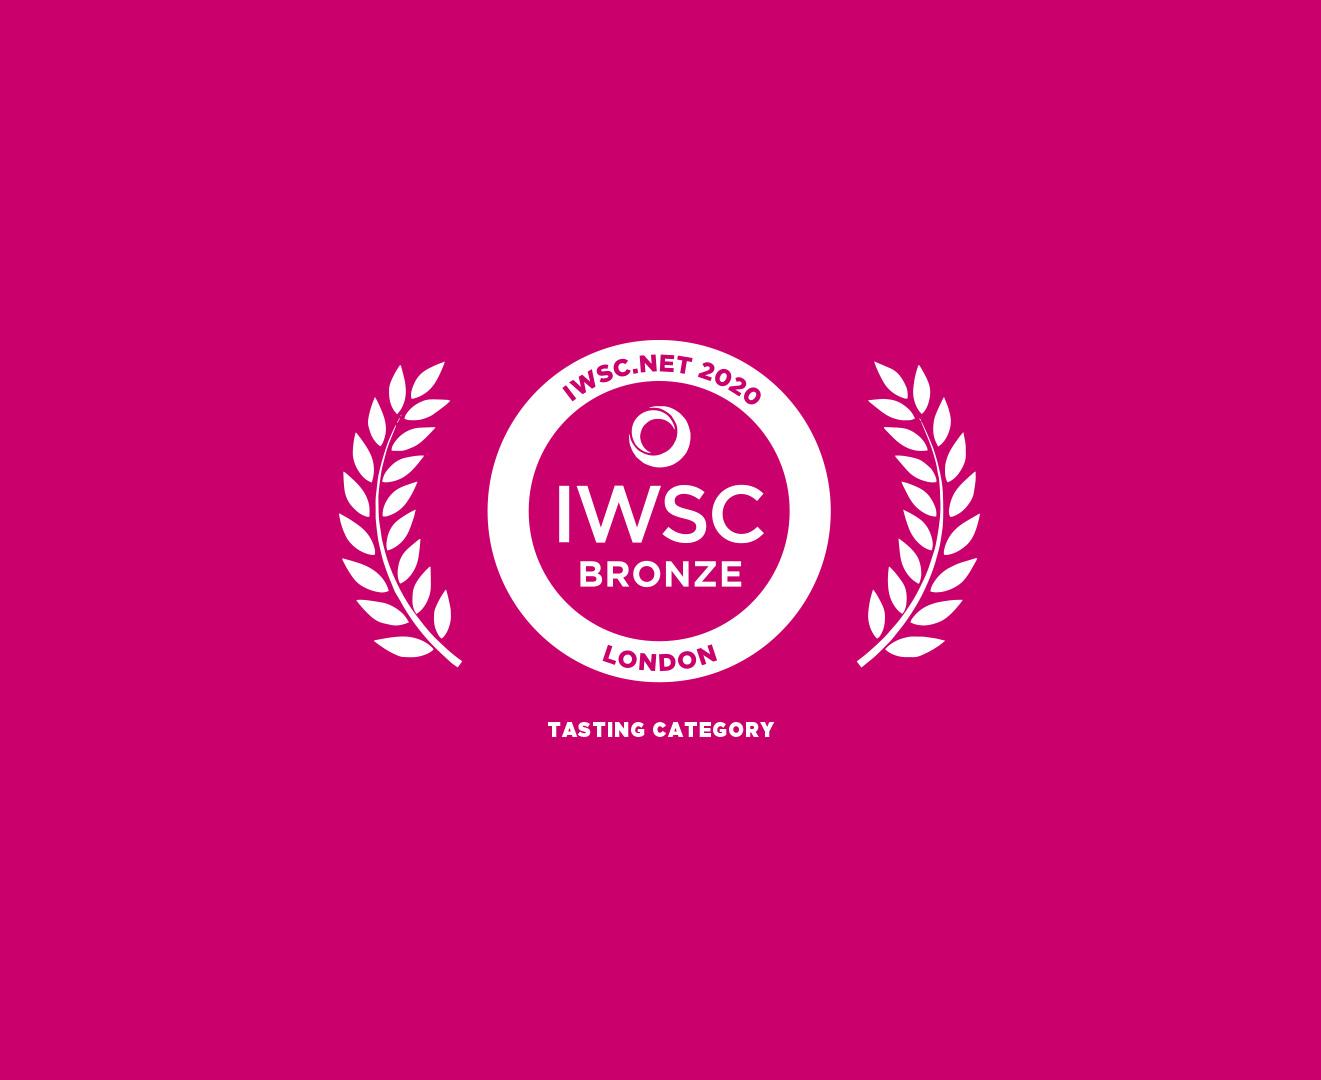 bg-award-iwsc-bronze